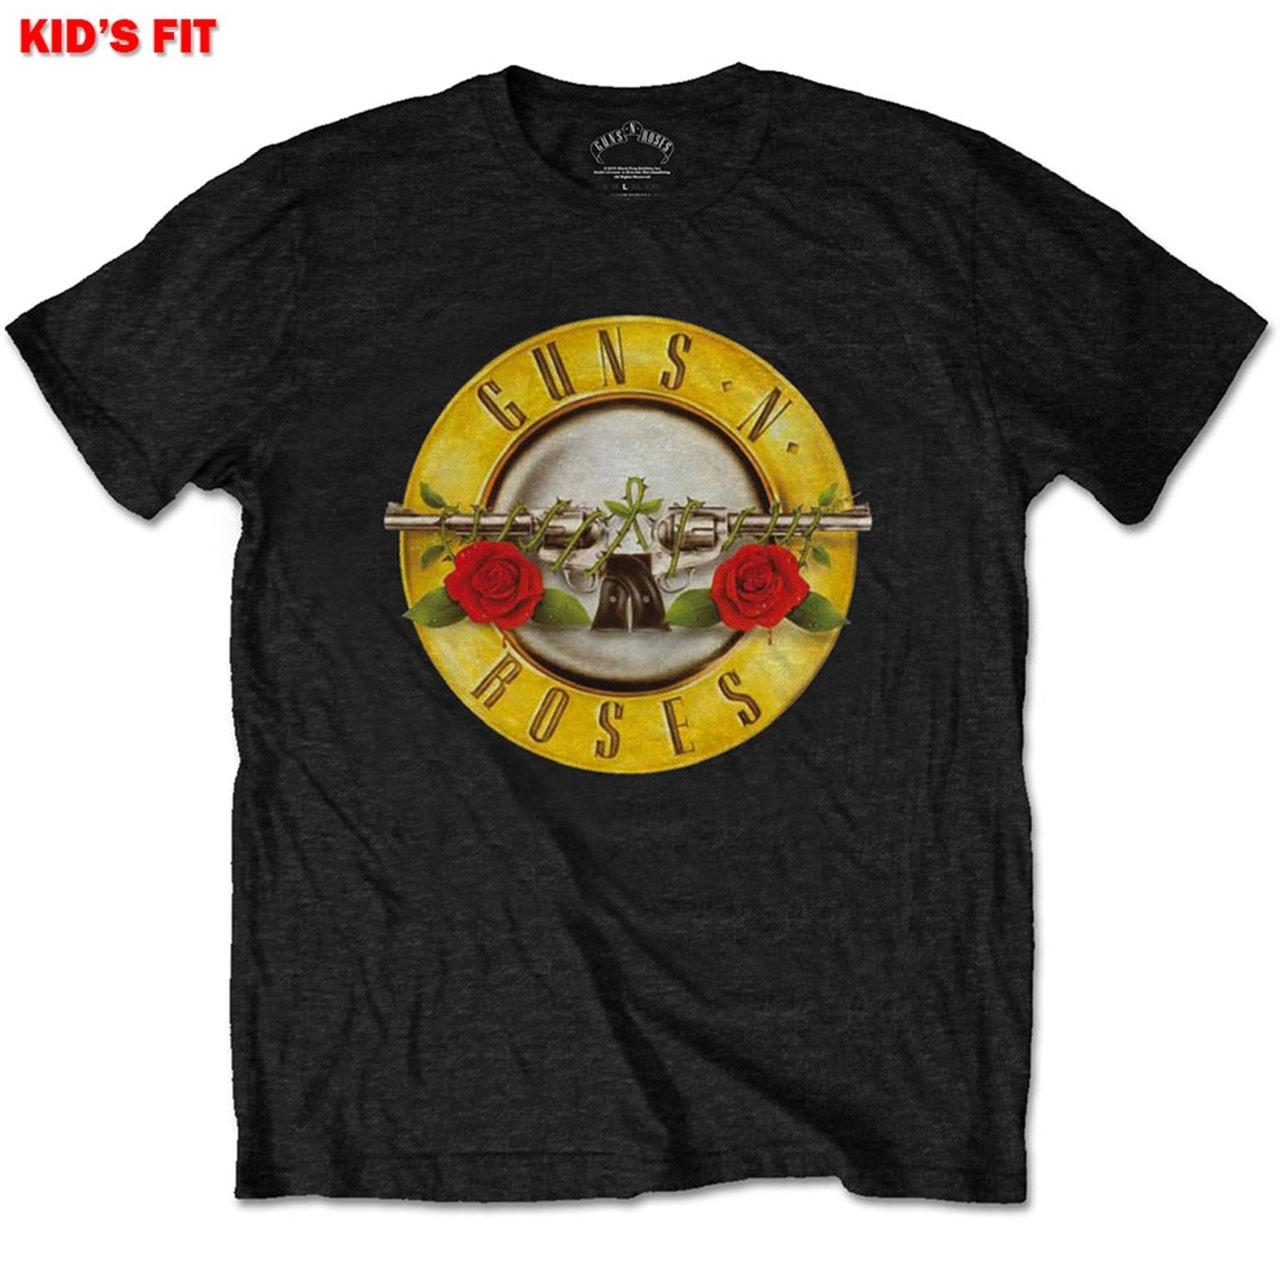 Guns N' Roses: Classic Logo (Kids Tee) (7-8YR) - 1